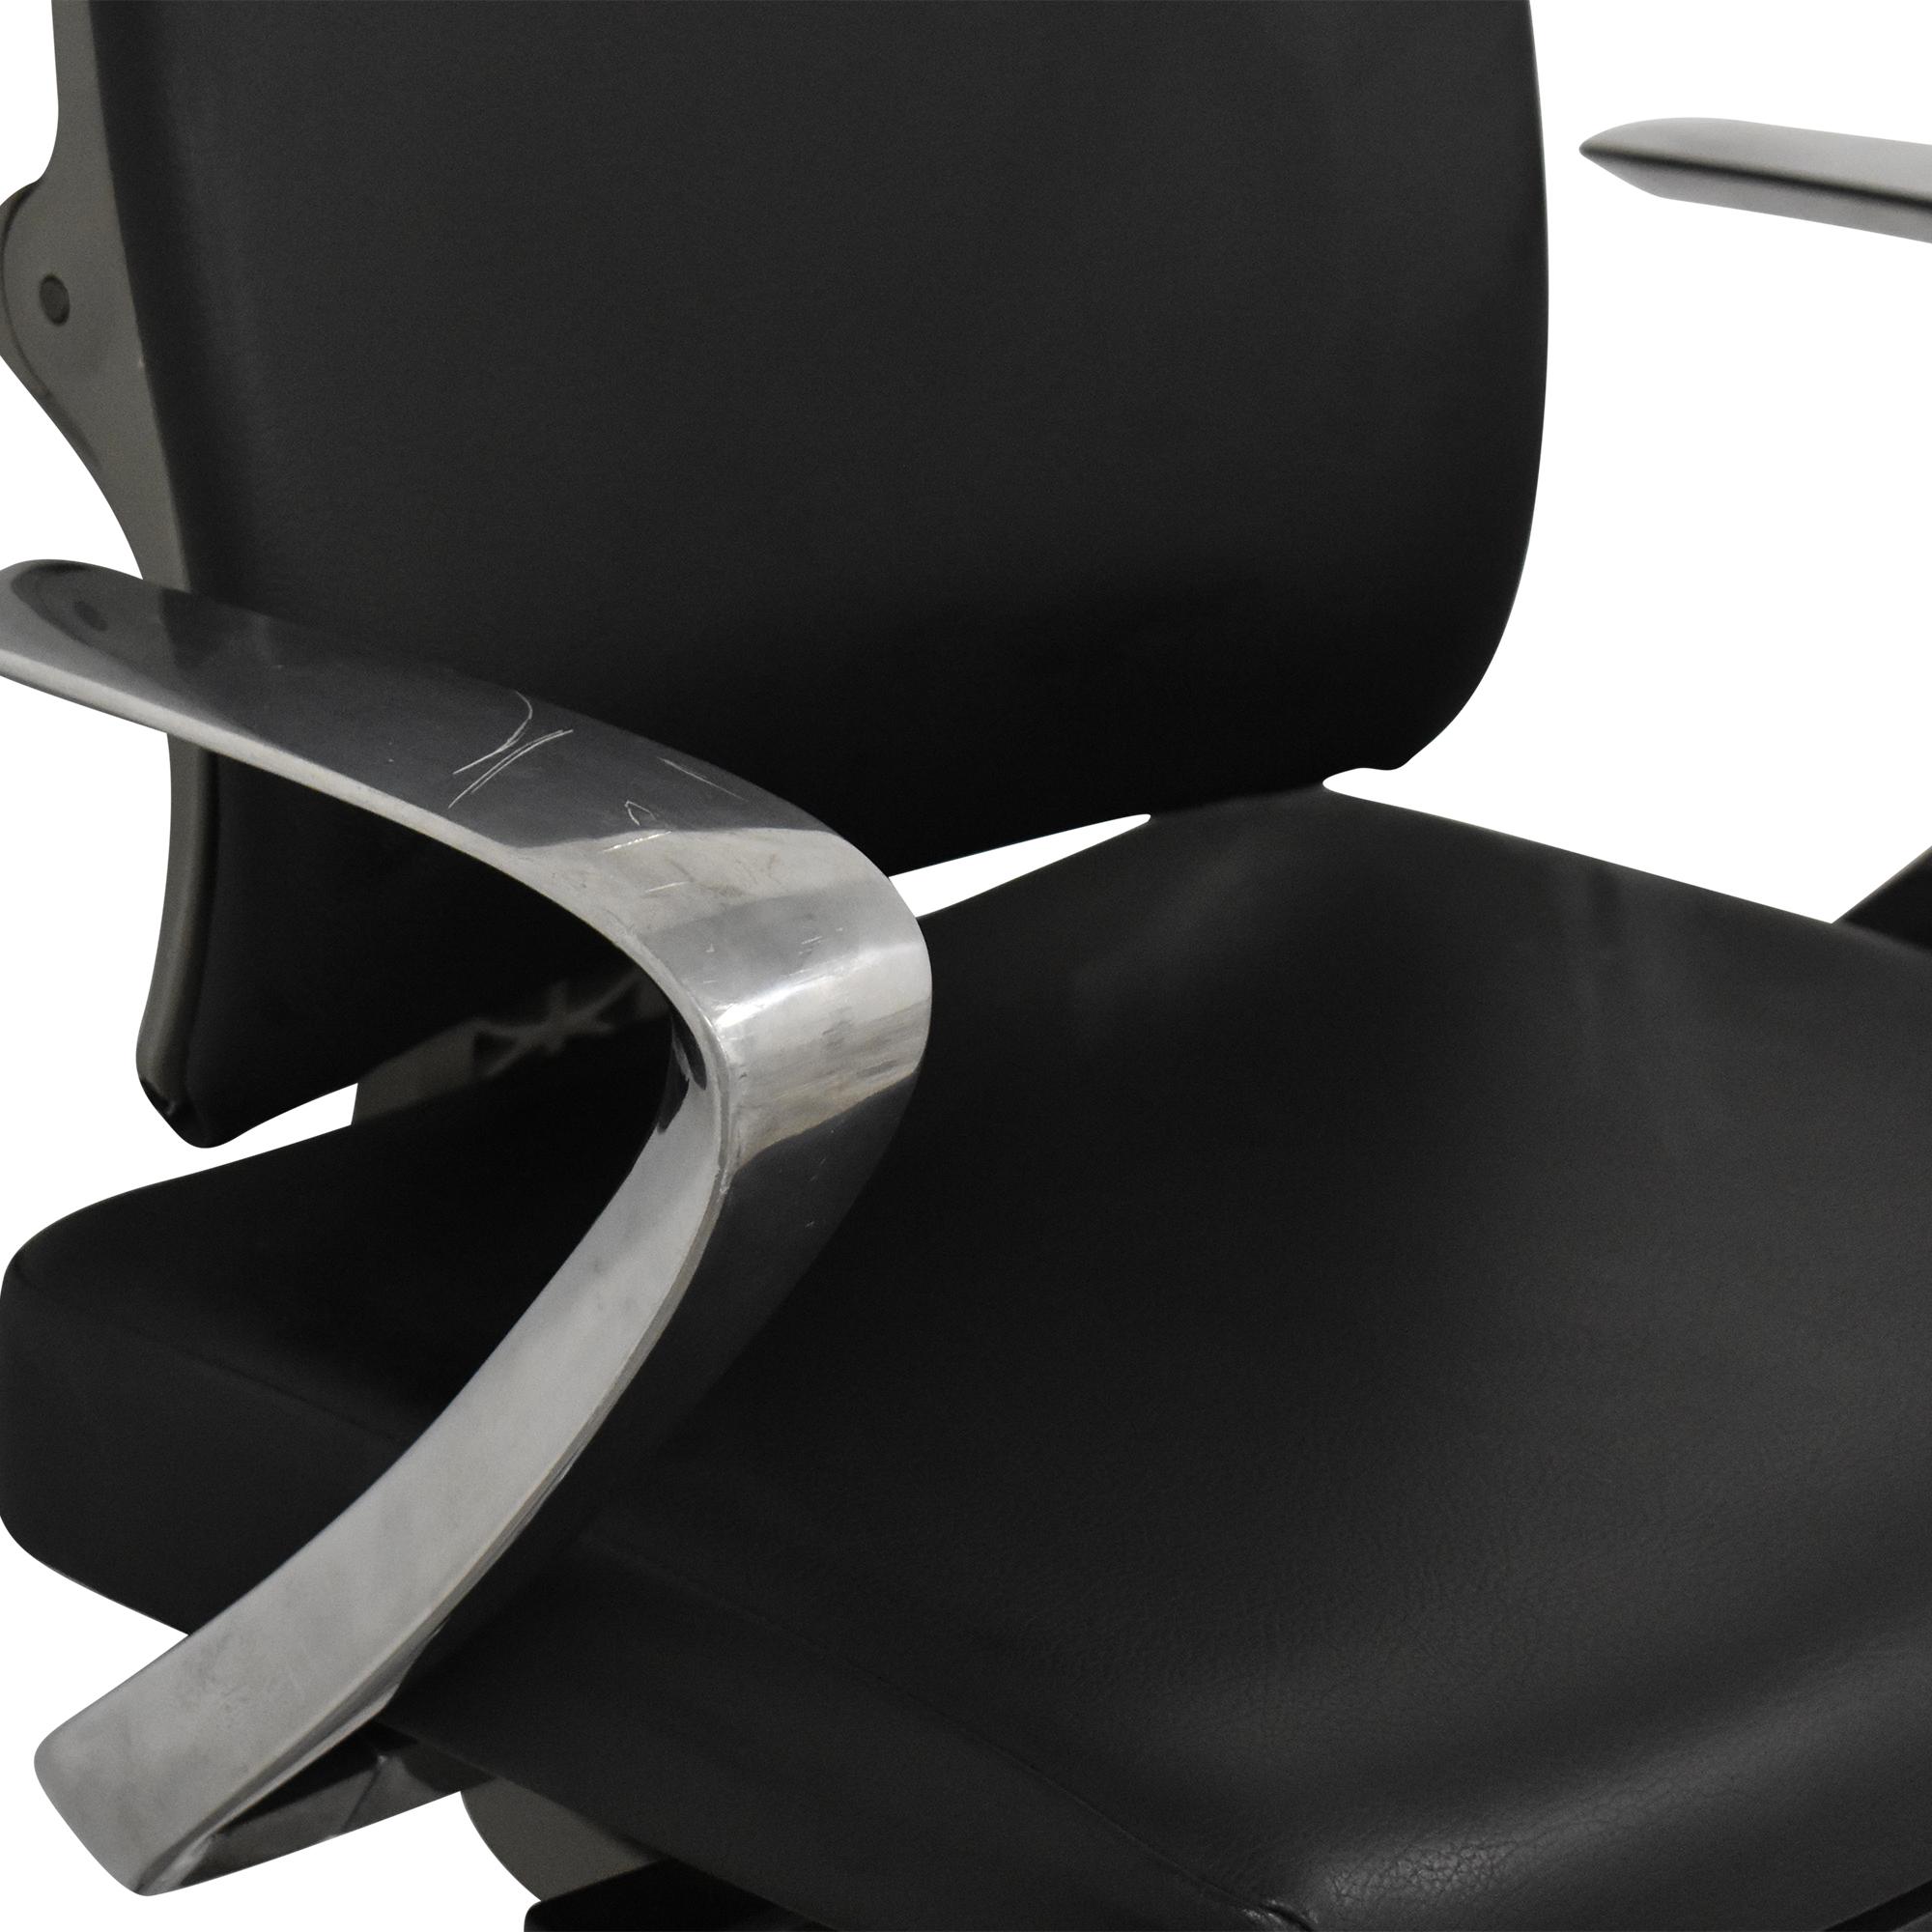 Allsteel Allsteel Task Chair price